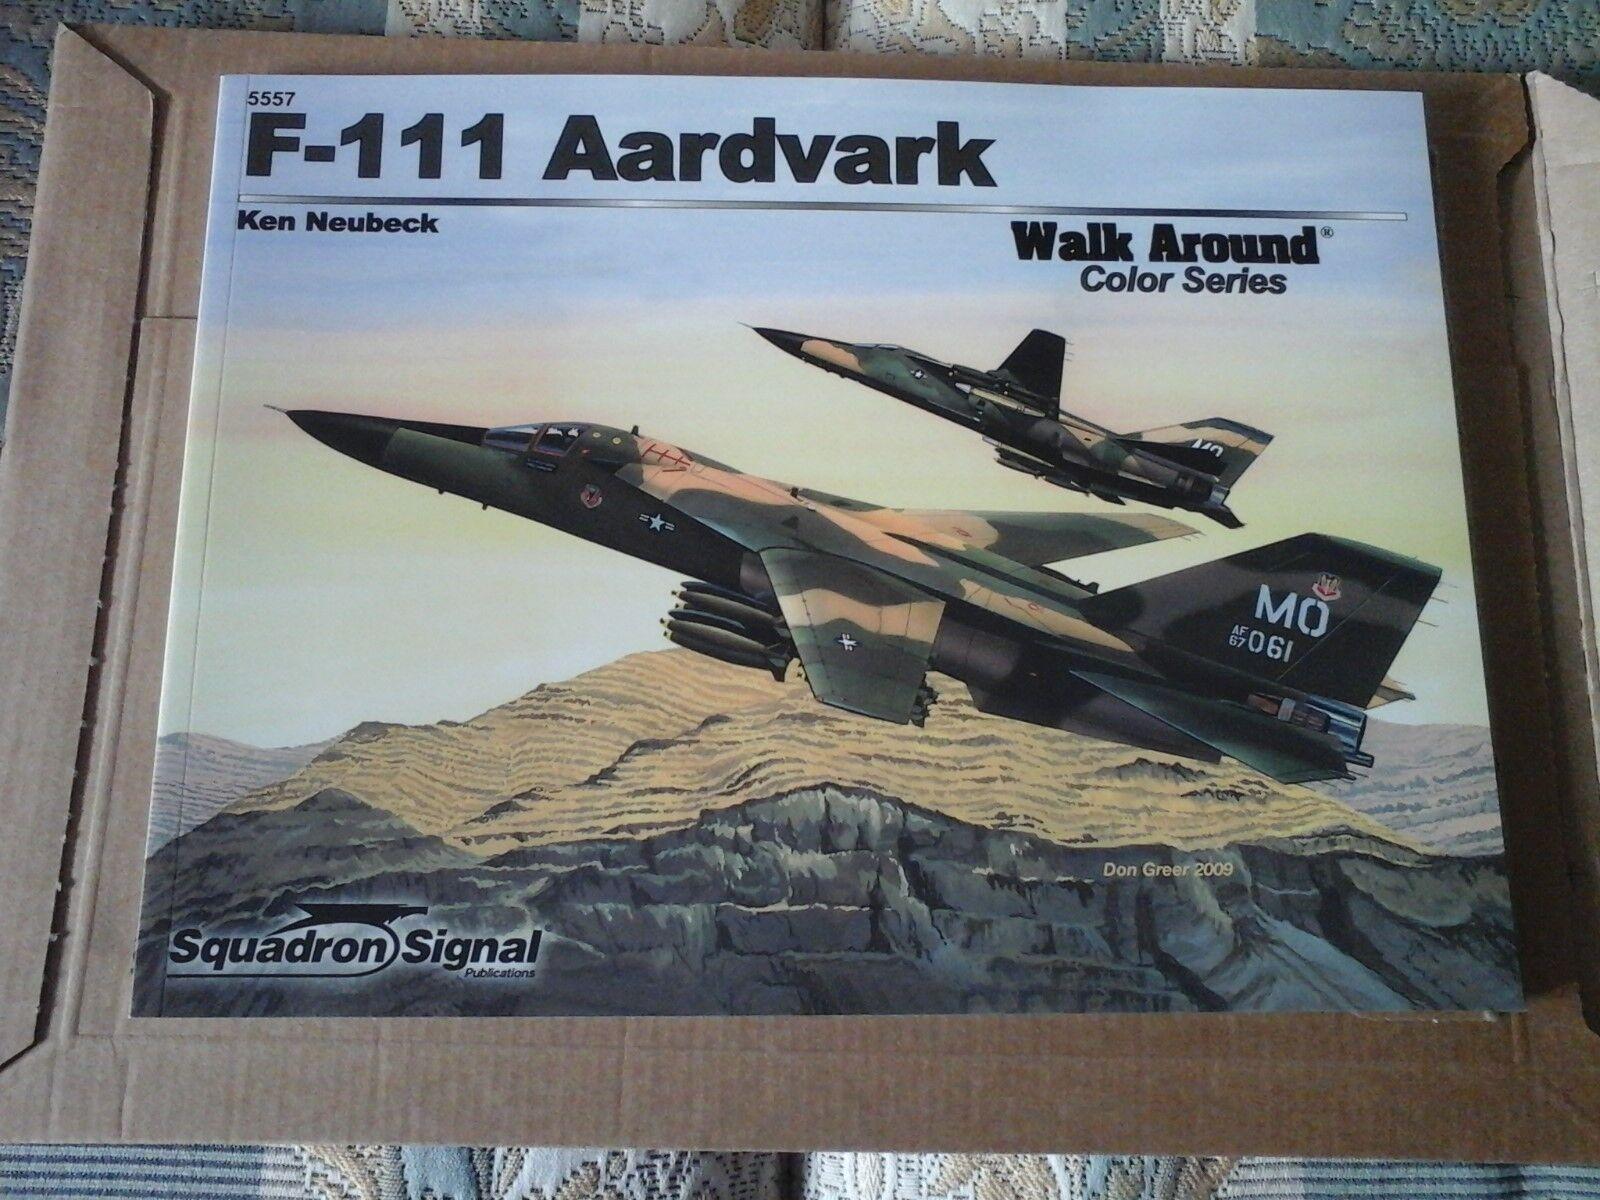 F-111 AARDVARK-SQUADRON SIGNAL WALK AROUND Color SERIES N.5557-BY KEN NEUBECK-